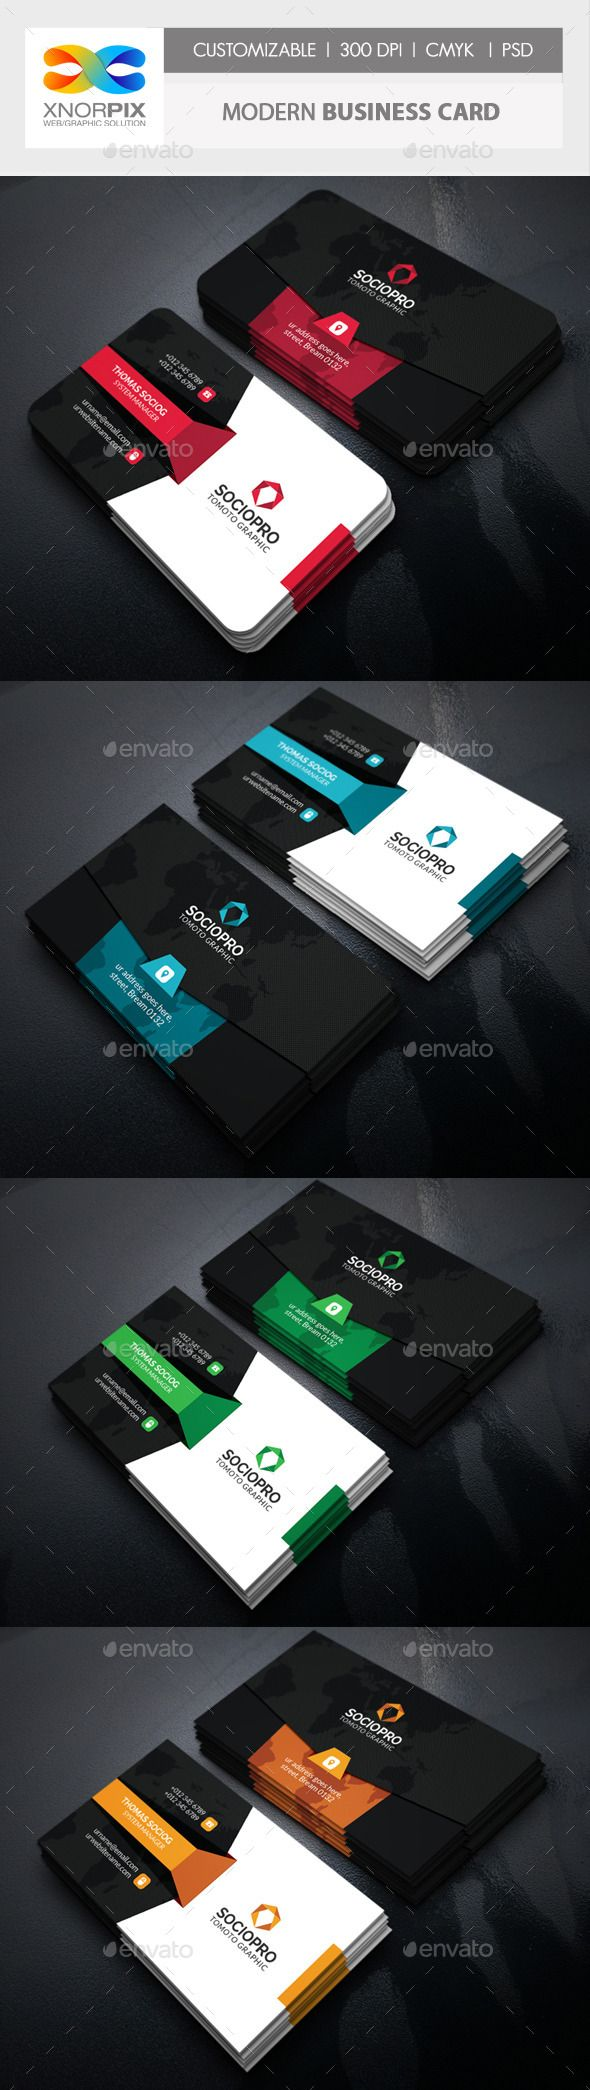 265 Best Business Card Images On Pinterest Business Card Design